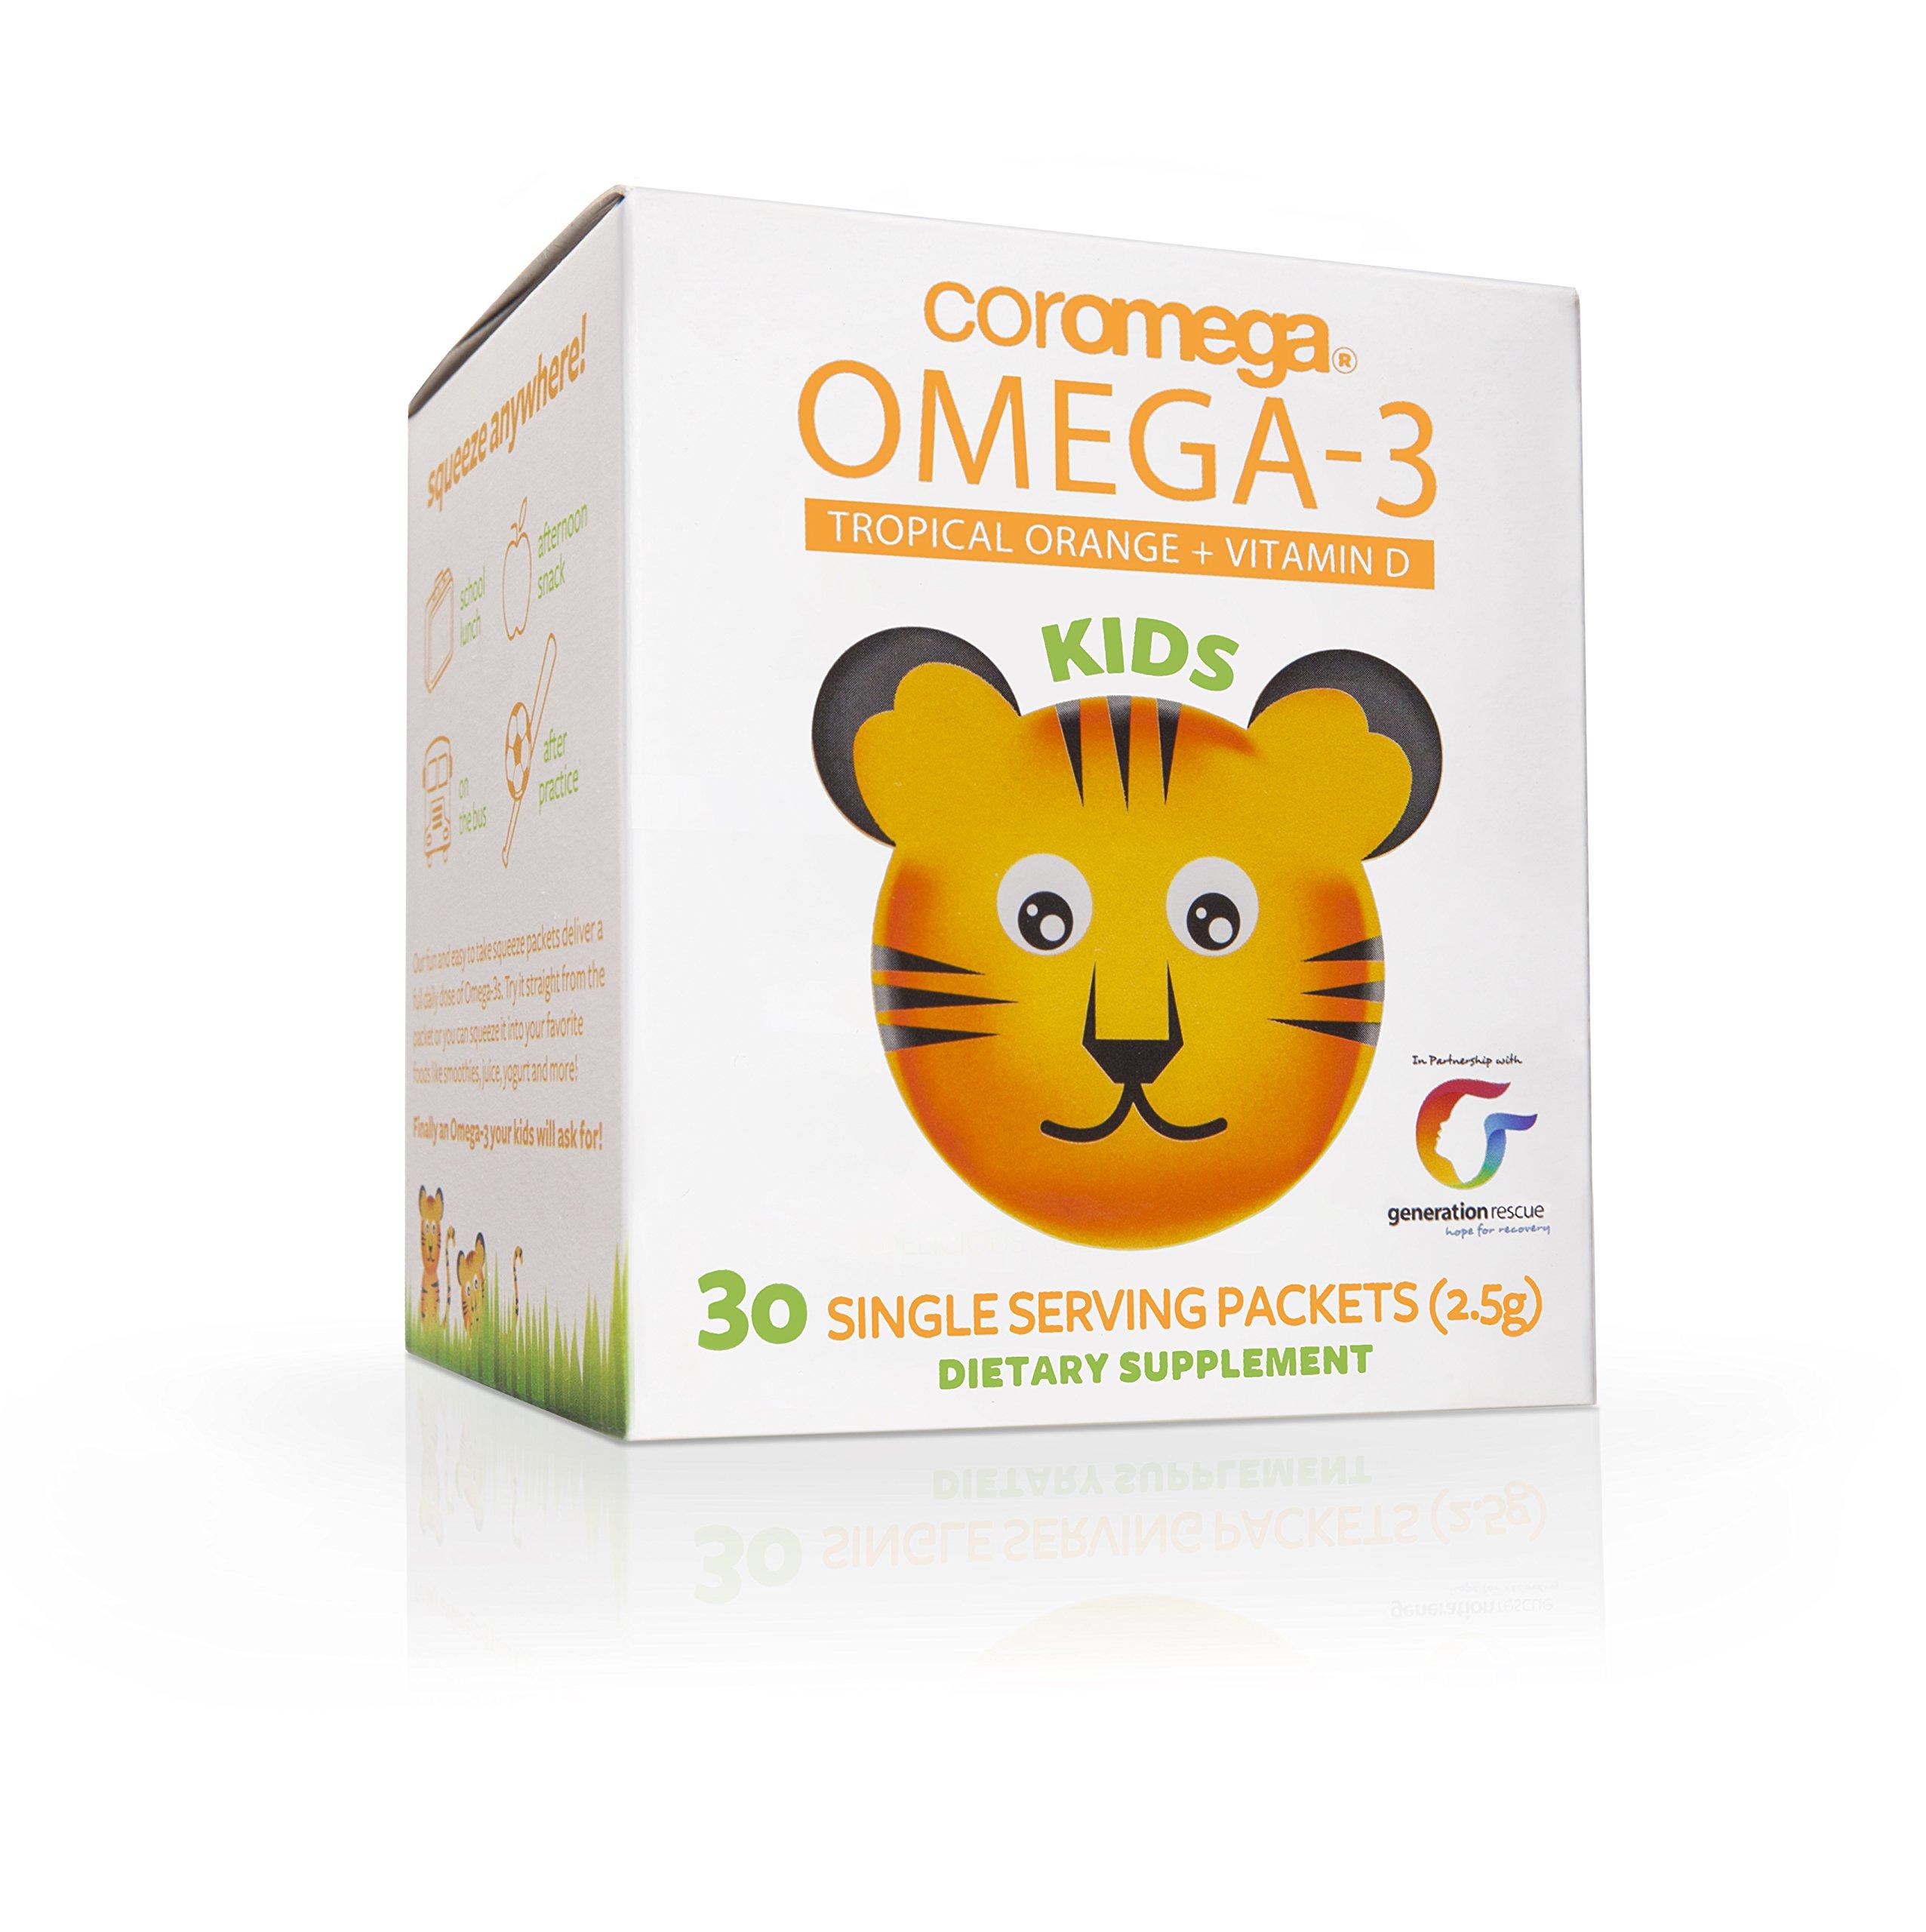 Coromega Kids Omega-3 Fish Oil Squeeze Packets, EPA and DHA, Brain Health, Eye Health, and Growth Development, 30-Count